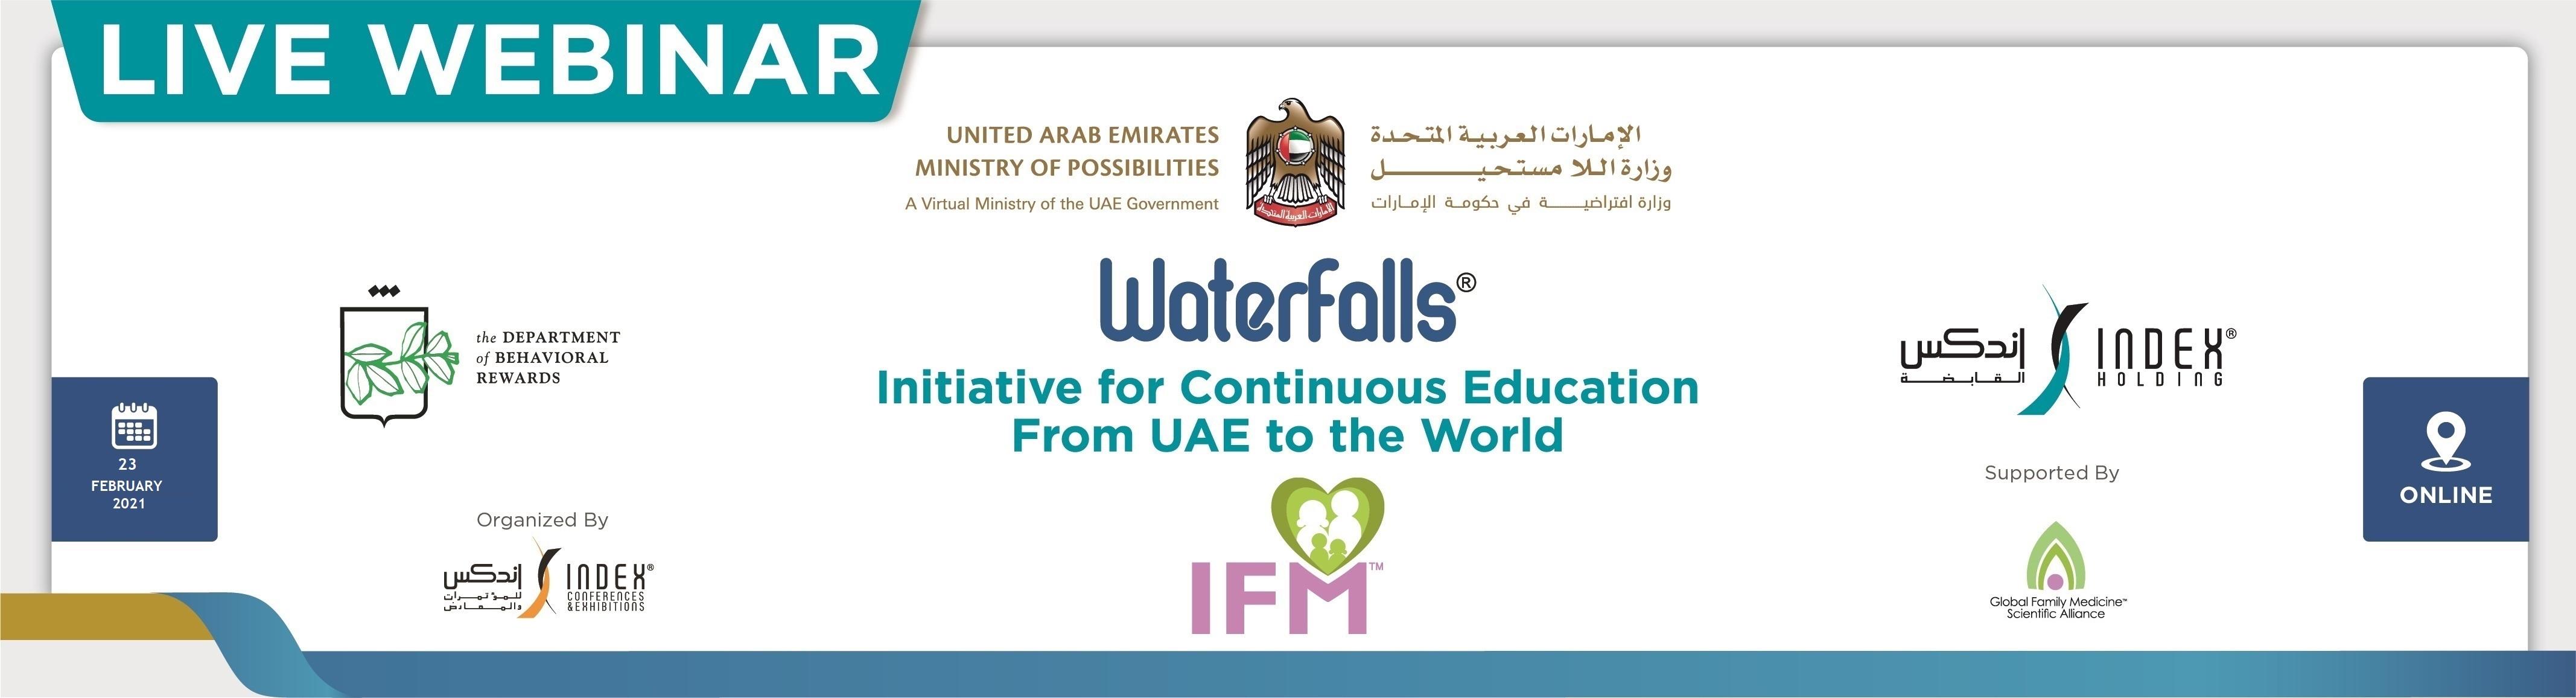 IFM Webinar: Brain Health and Stroke Prevention Feb 16 (19:00 - 20:00 UAE)